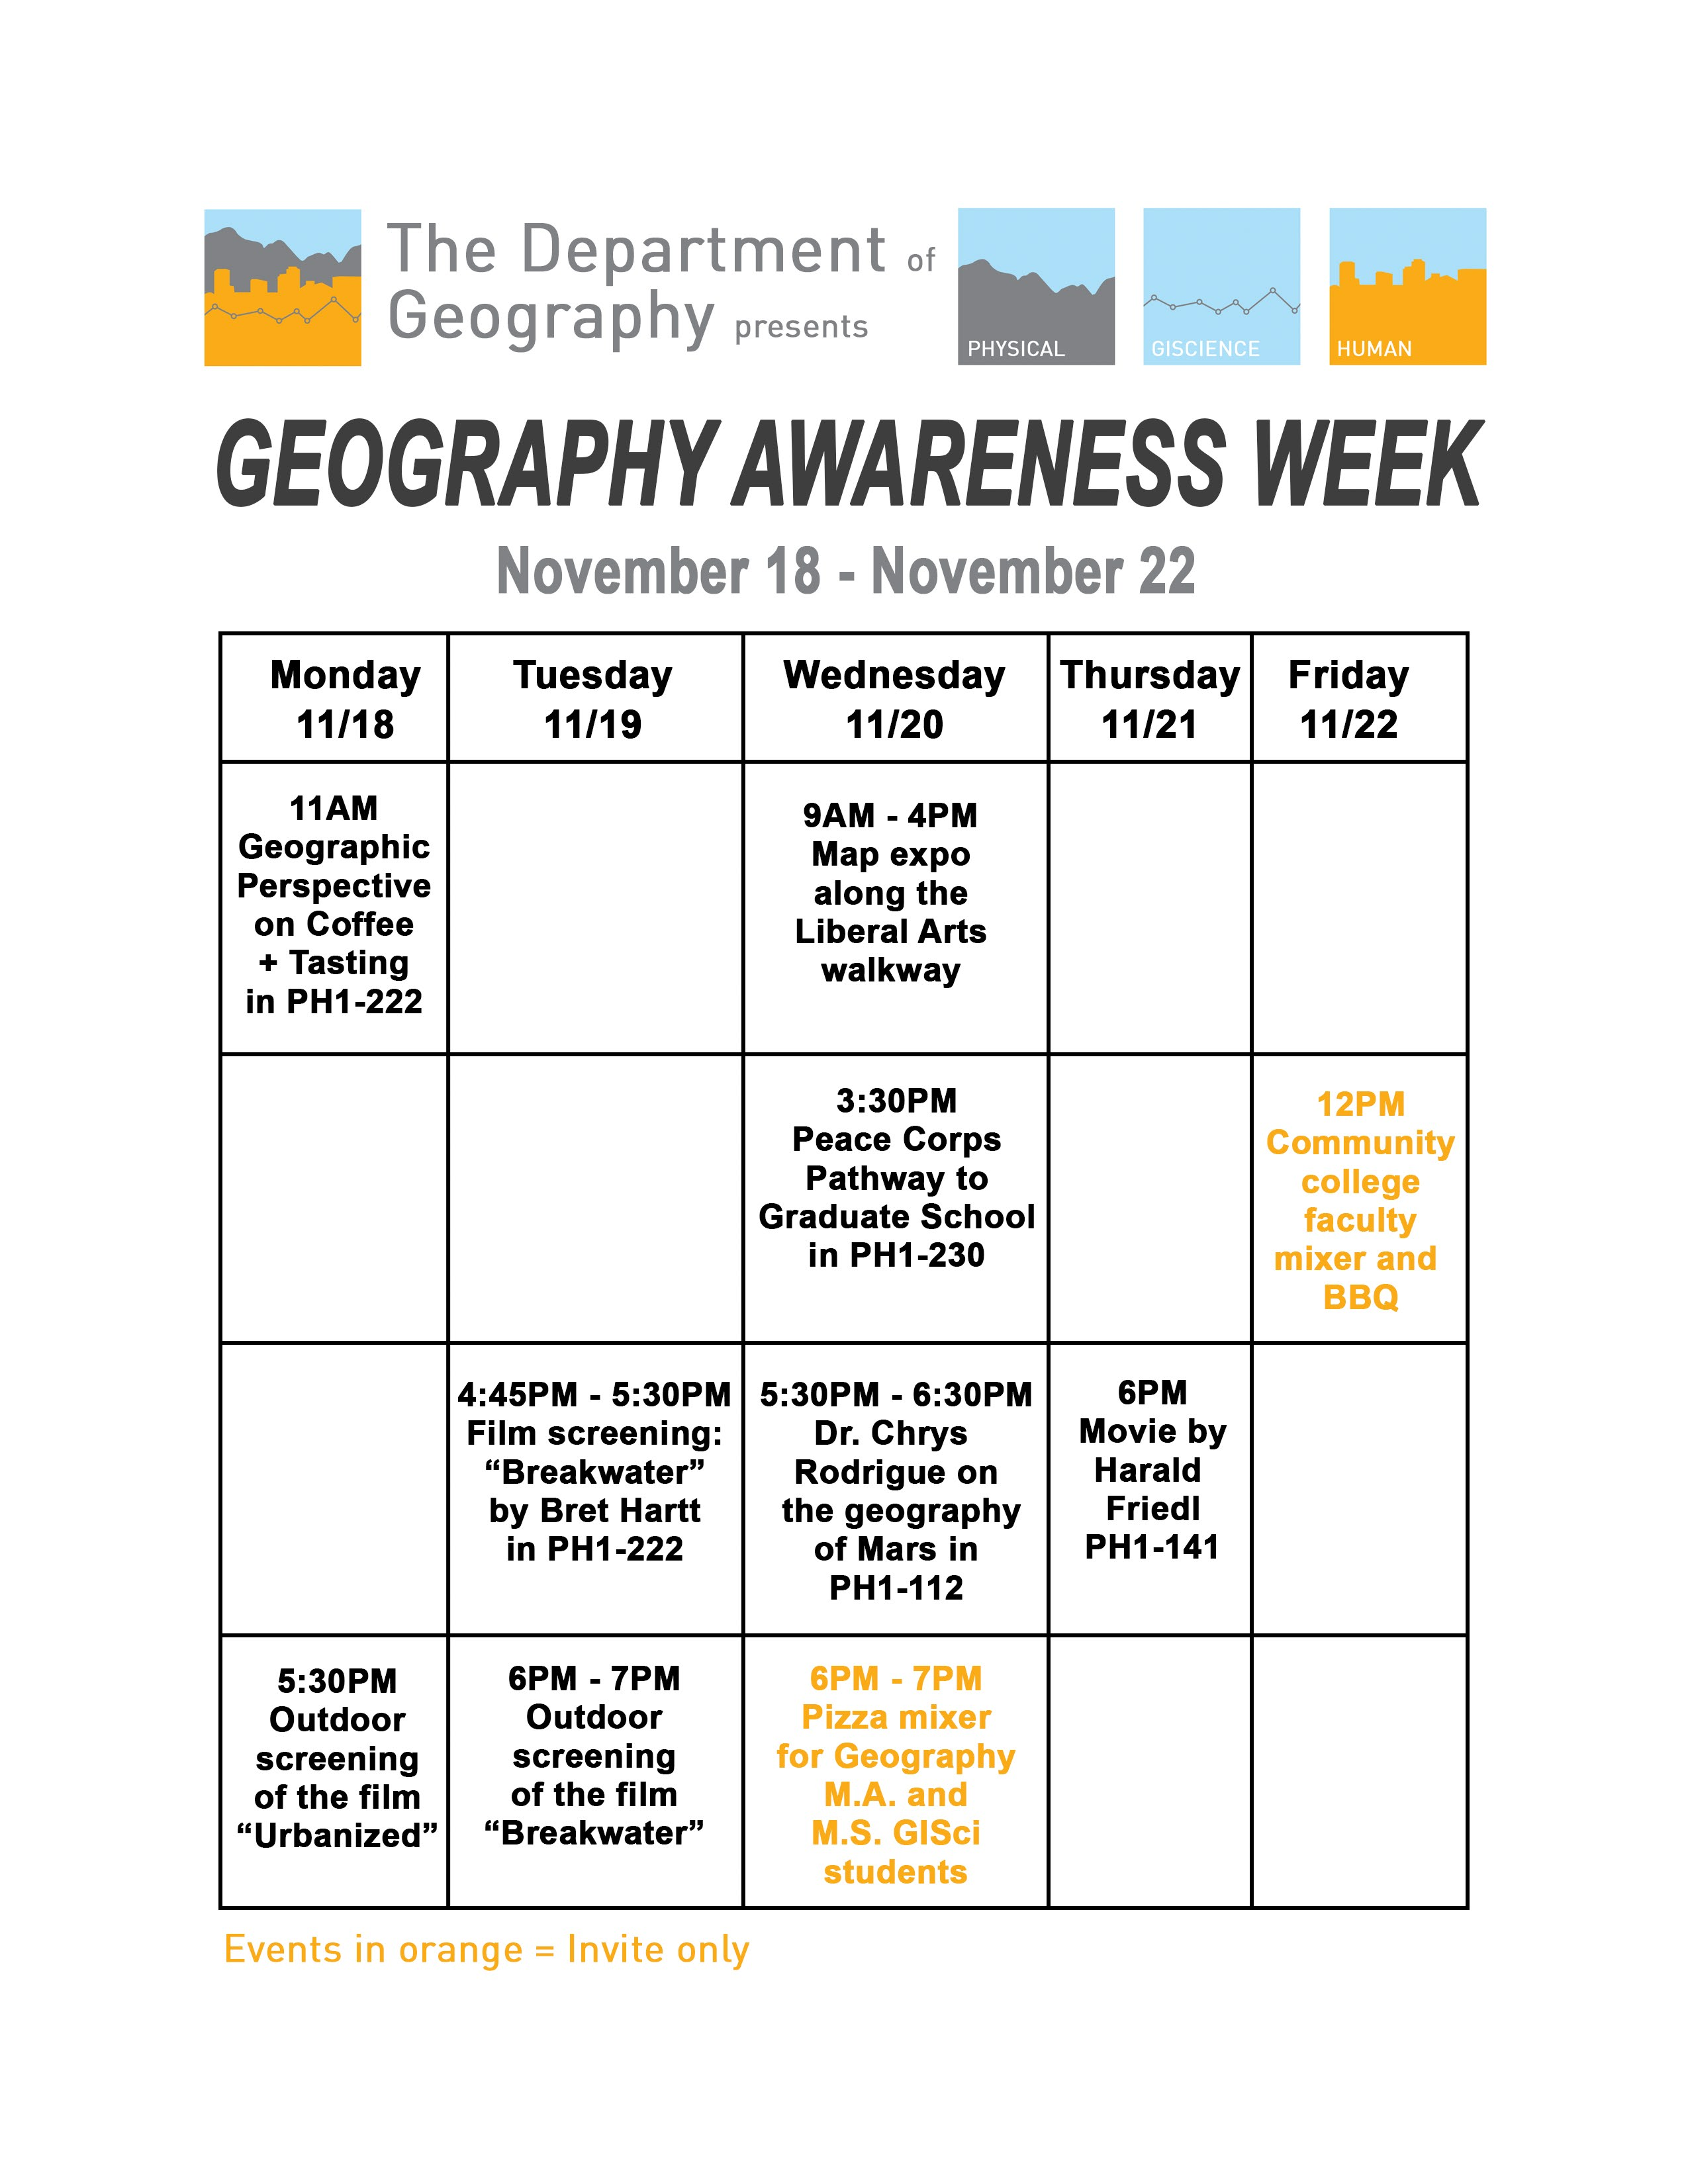 GeographyAwarenessWeekFlyer_Revised